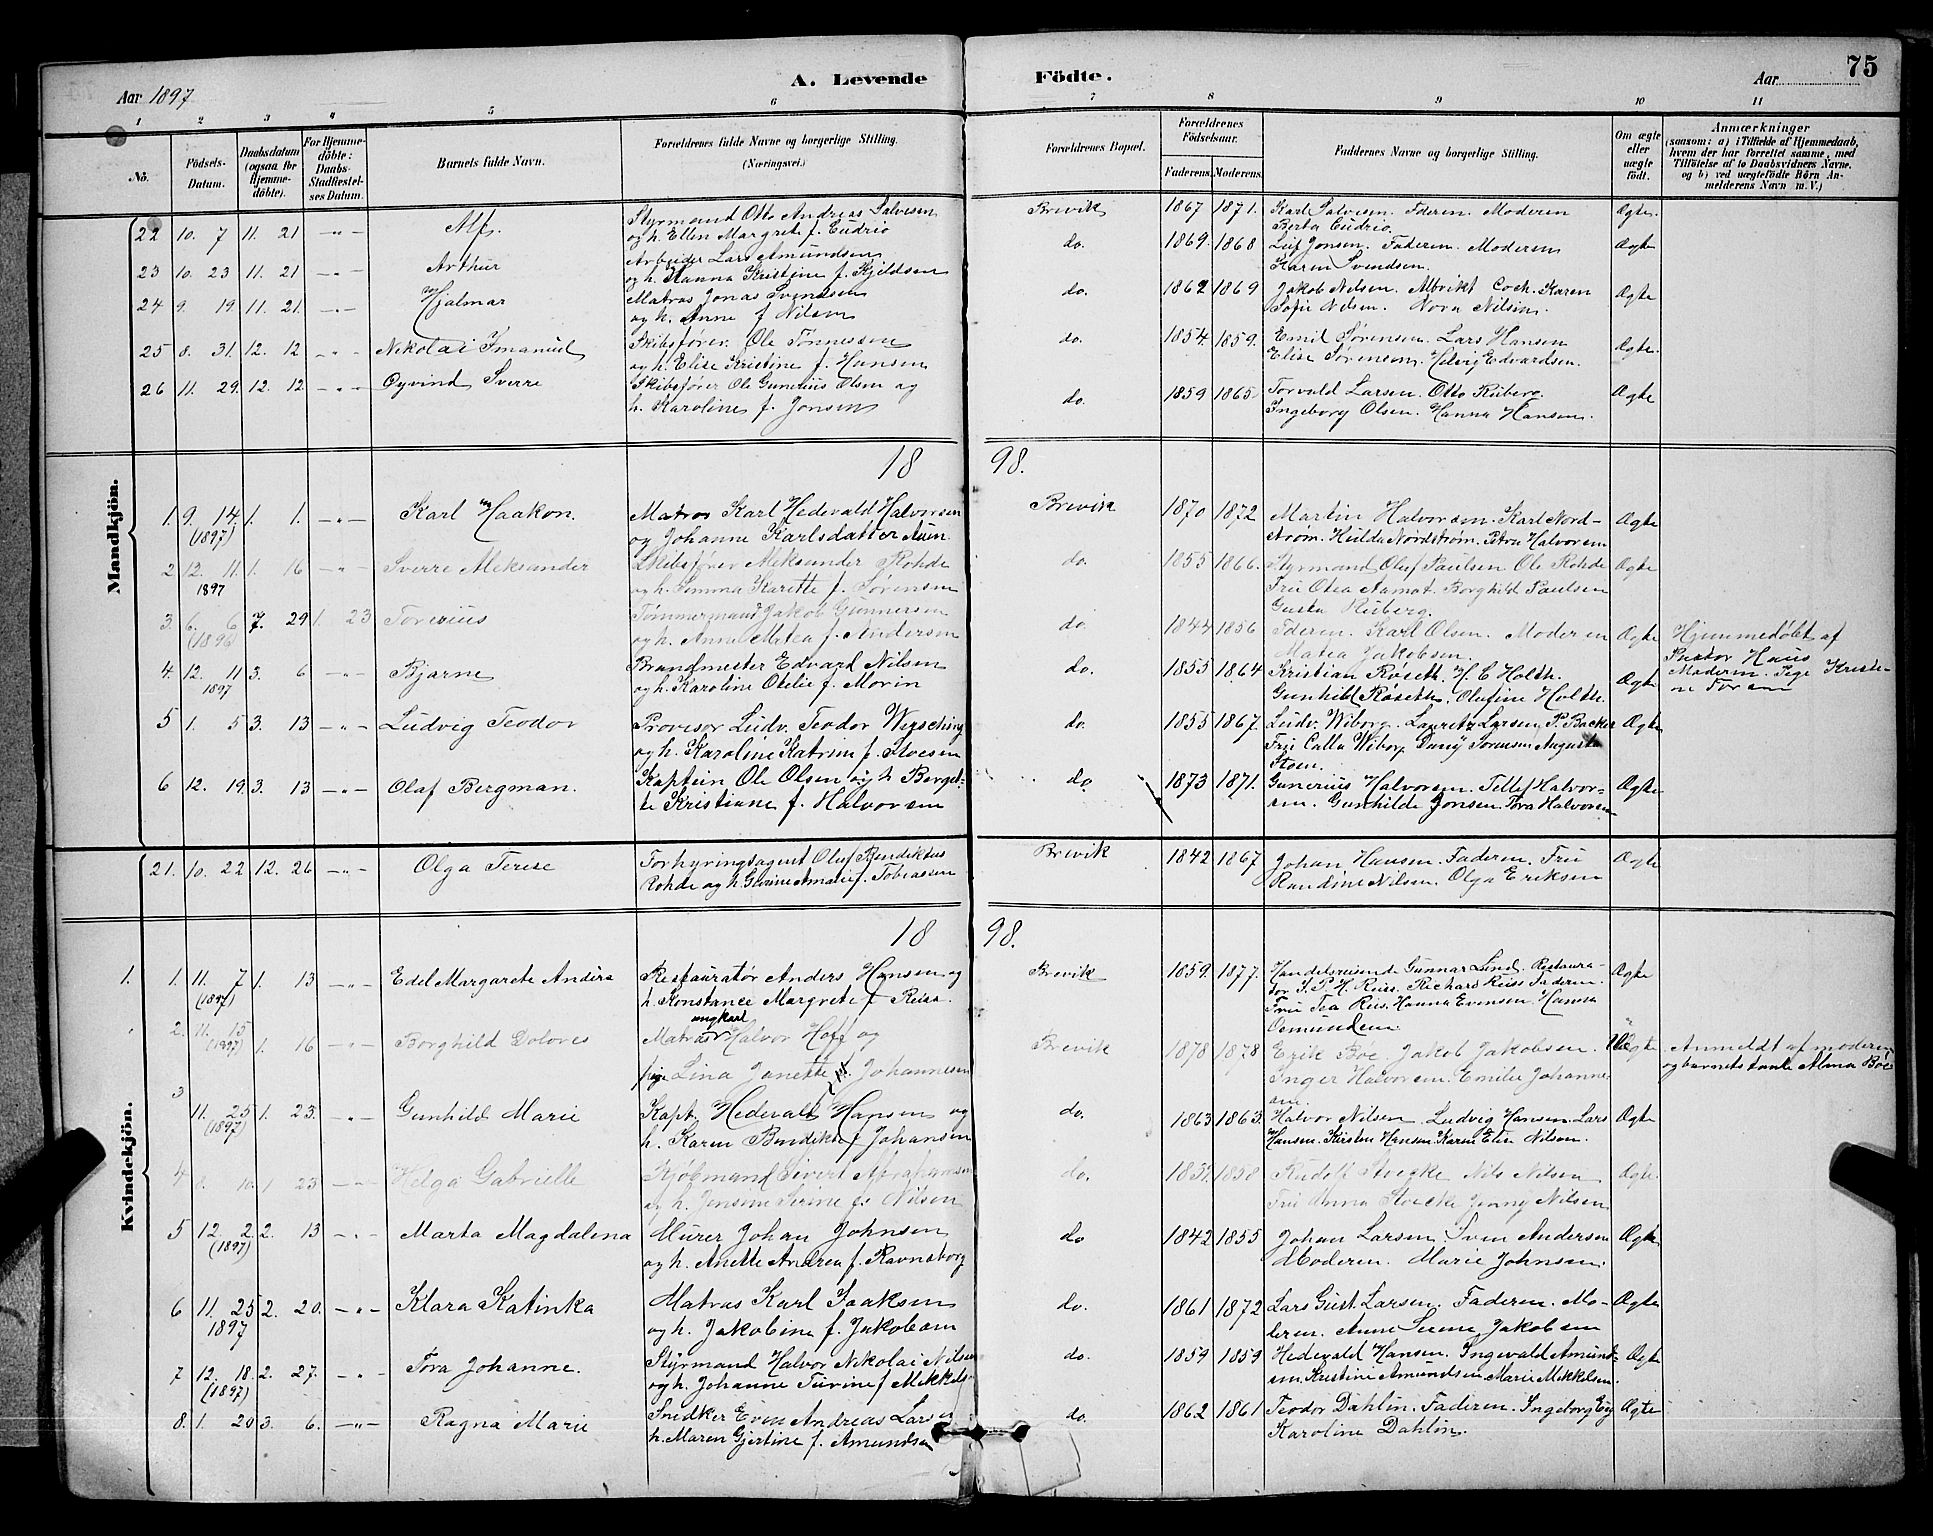 SAKO, Brevik kirkebøker, G/Ga/L0004: Klokkerbok nr. 4, 1882-1900, s. 75